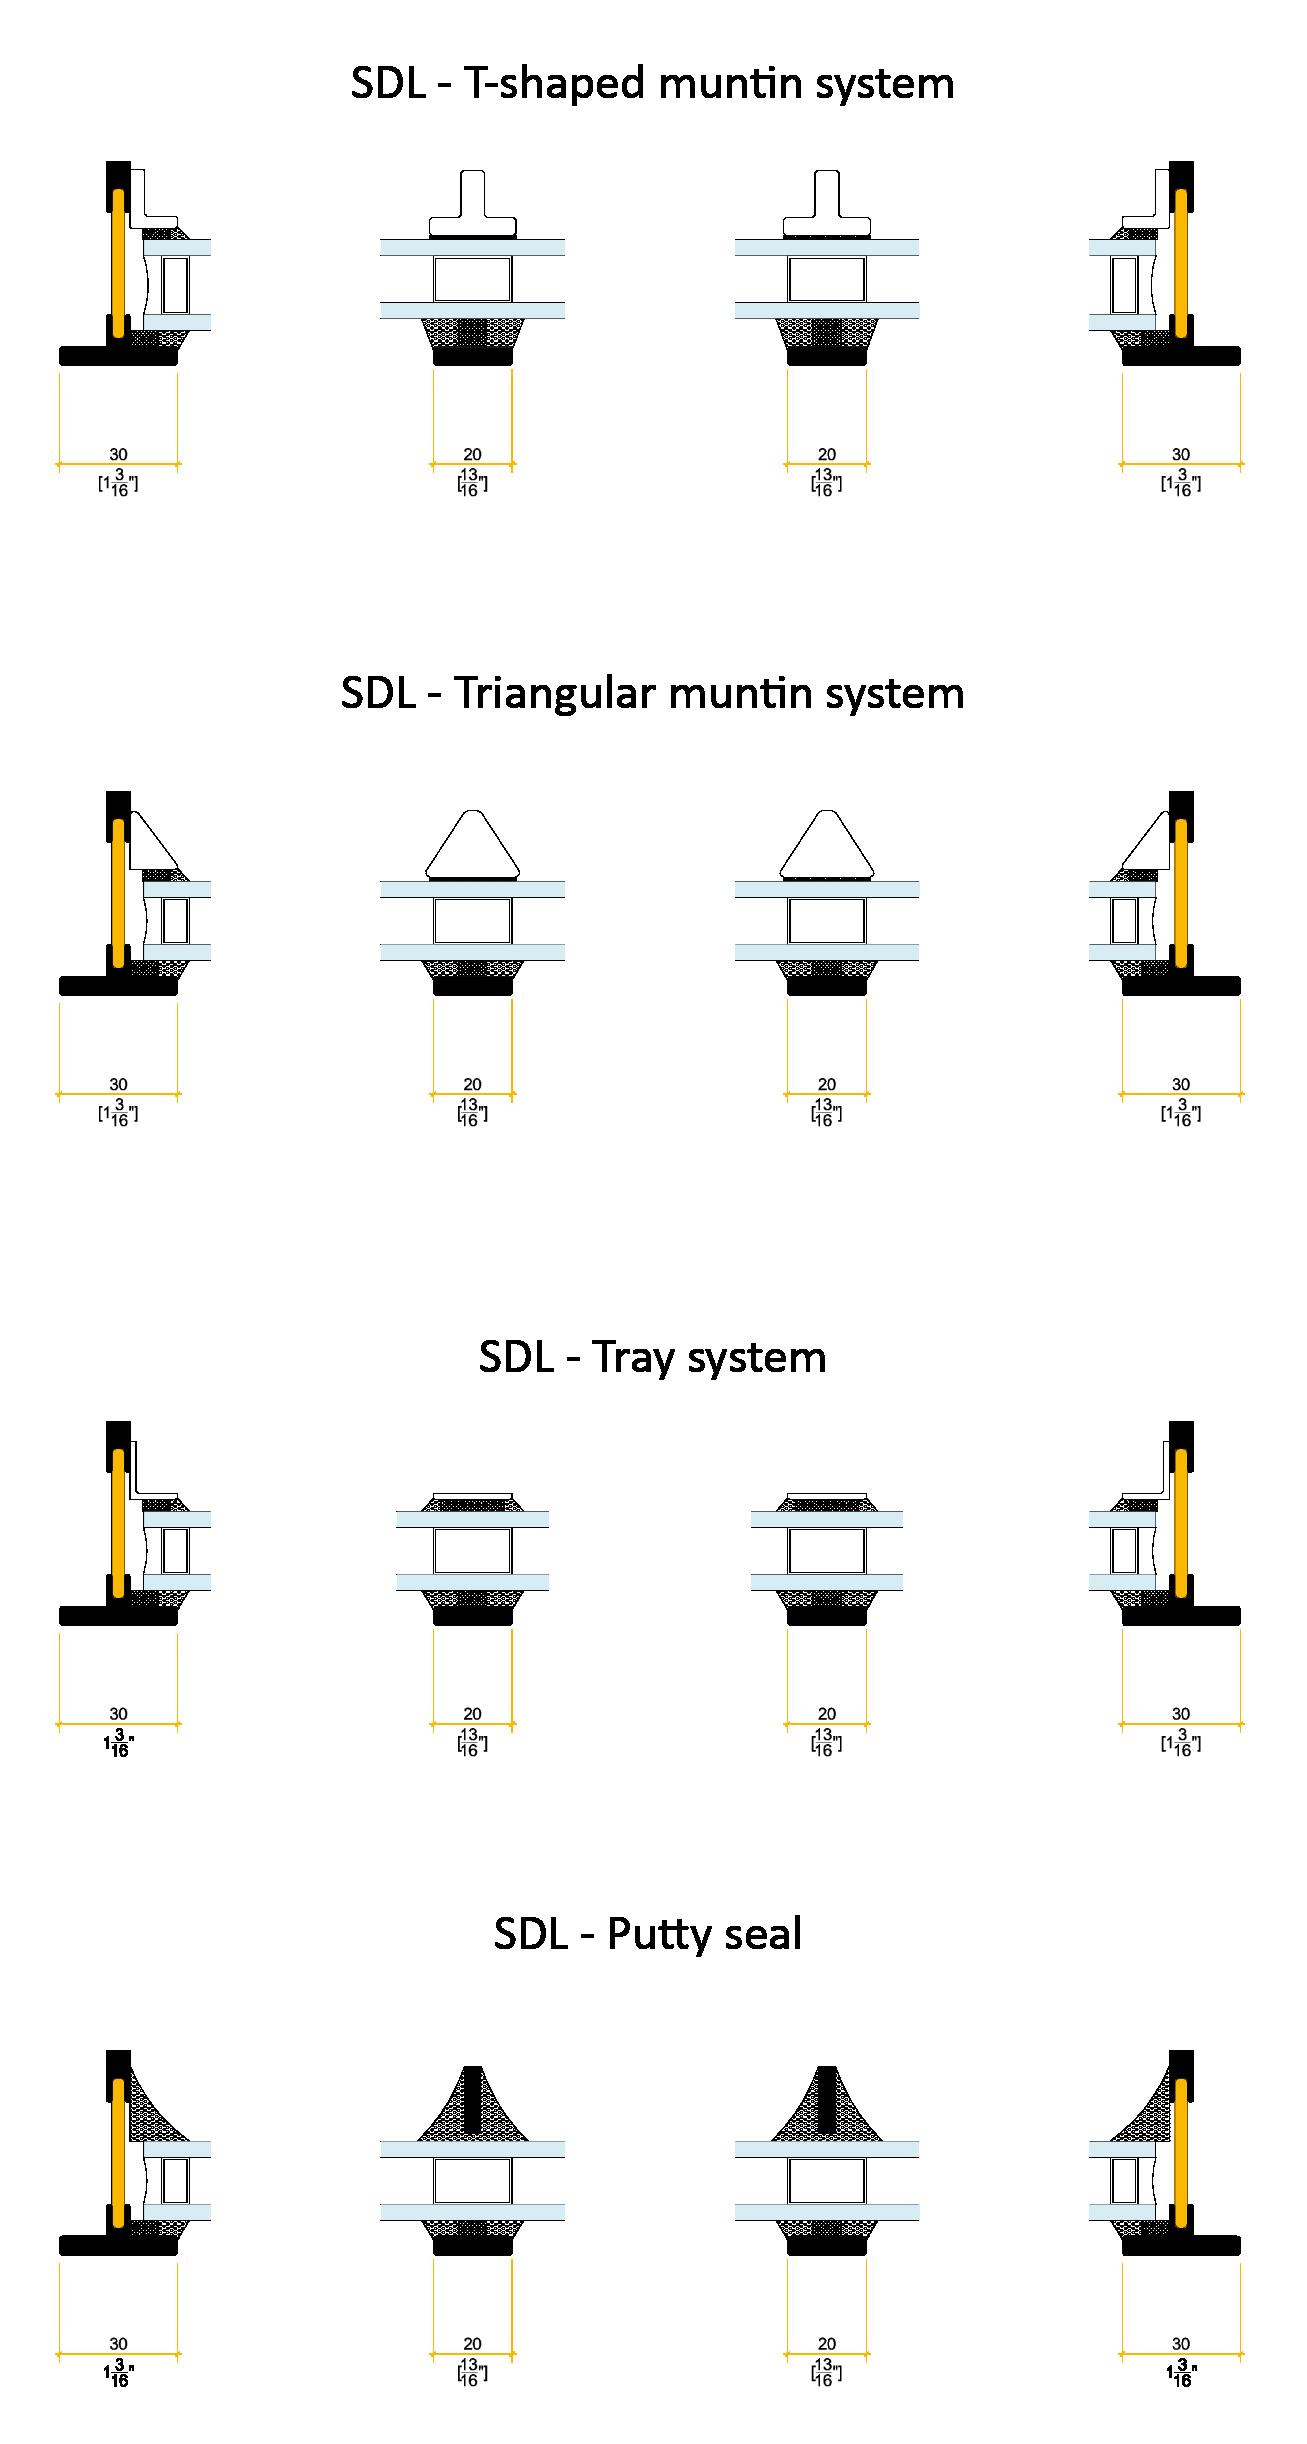 SDL - 52IG - CLASSIC-ISO - EN